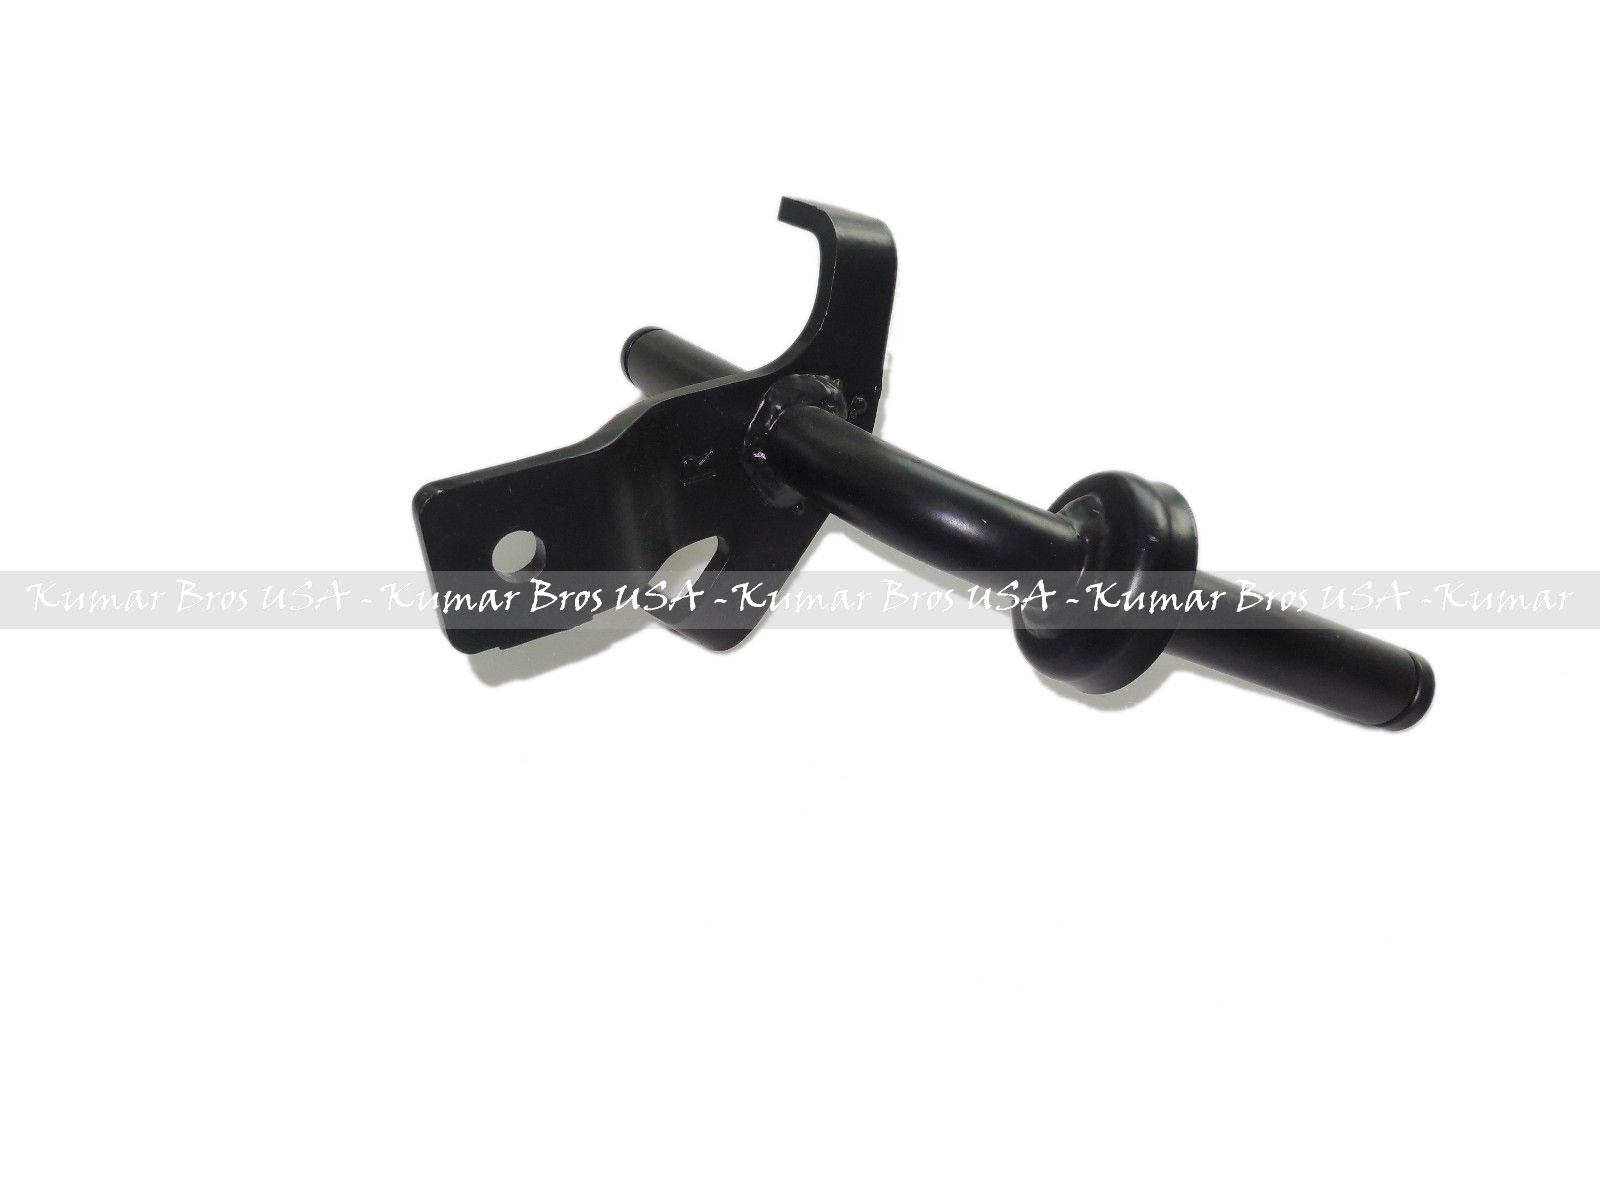 New Kumar Bros USA Steering Spindle Kit Bushing Fits John Deere L120 L130  G110